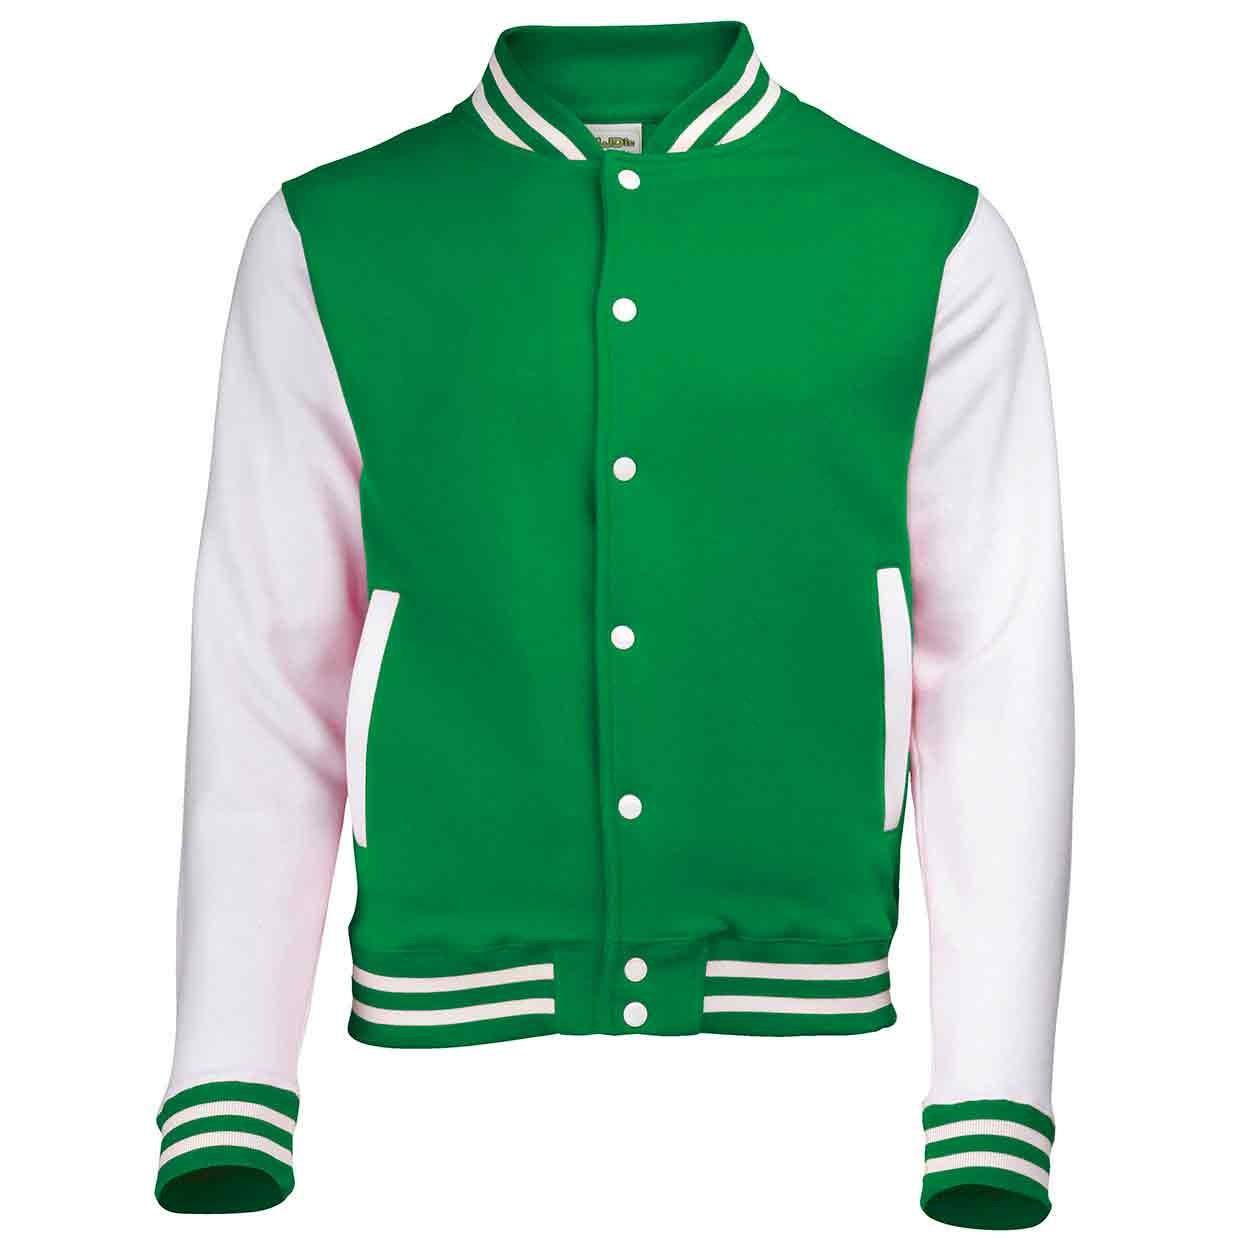 54cf9d59f AWDis Hoods JH043 Varsity Jacket - Zipped Jackets - Sweatshirt ...